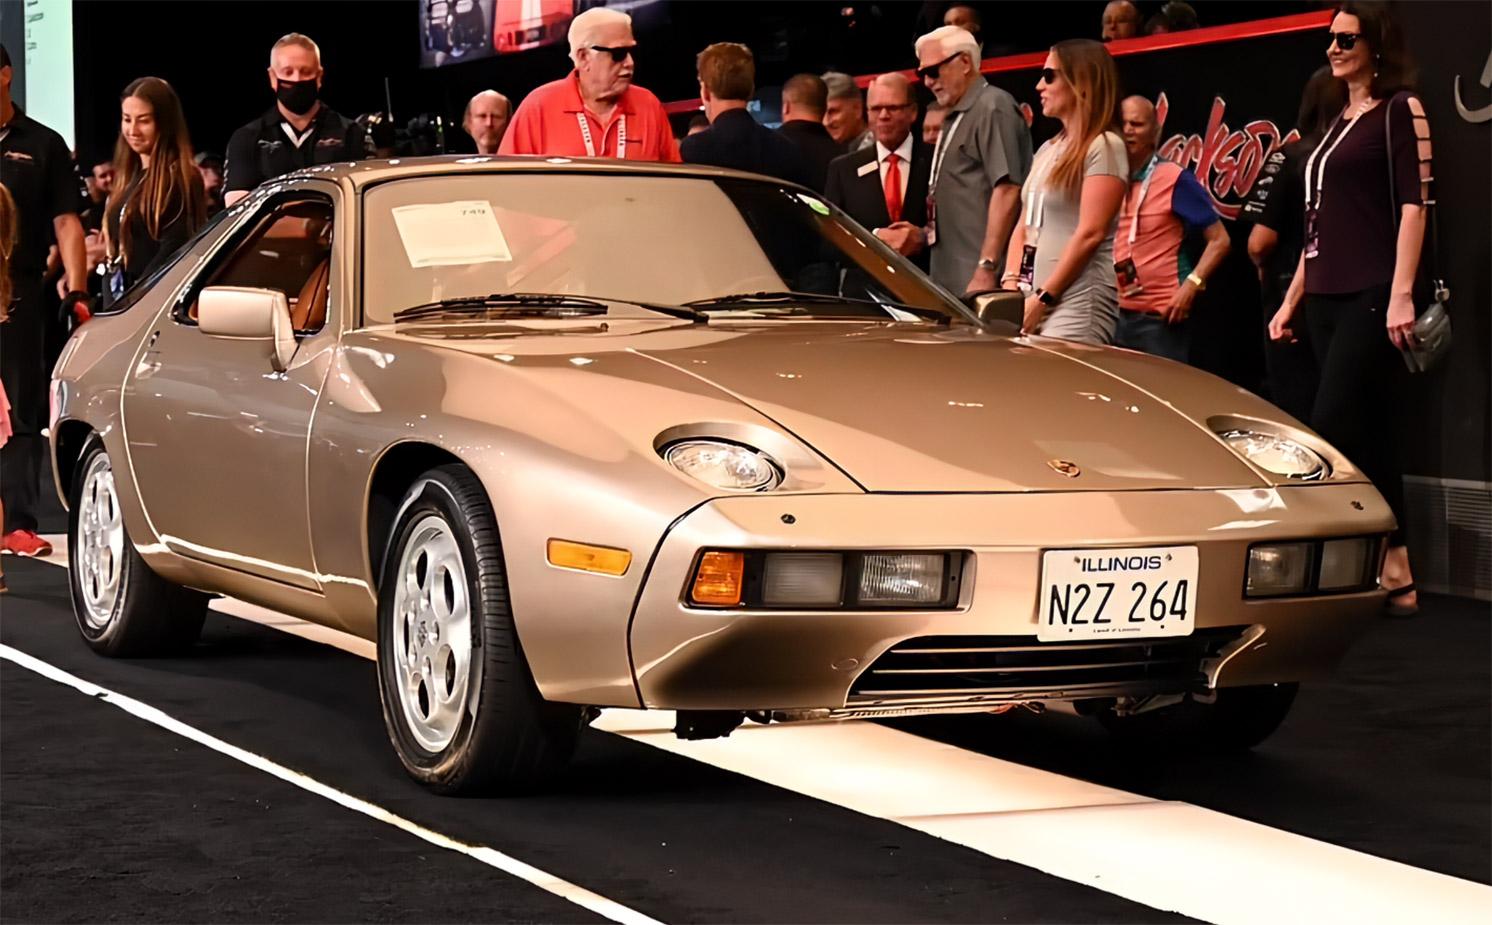 Tom Cruise Porsche 928 Risky Business Movie Barrett-Jackson